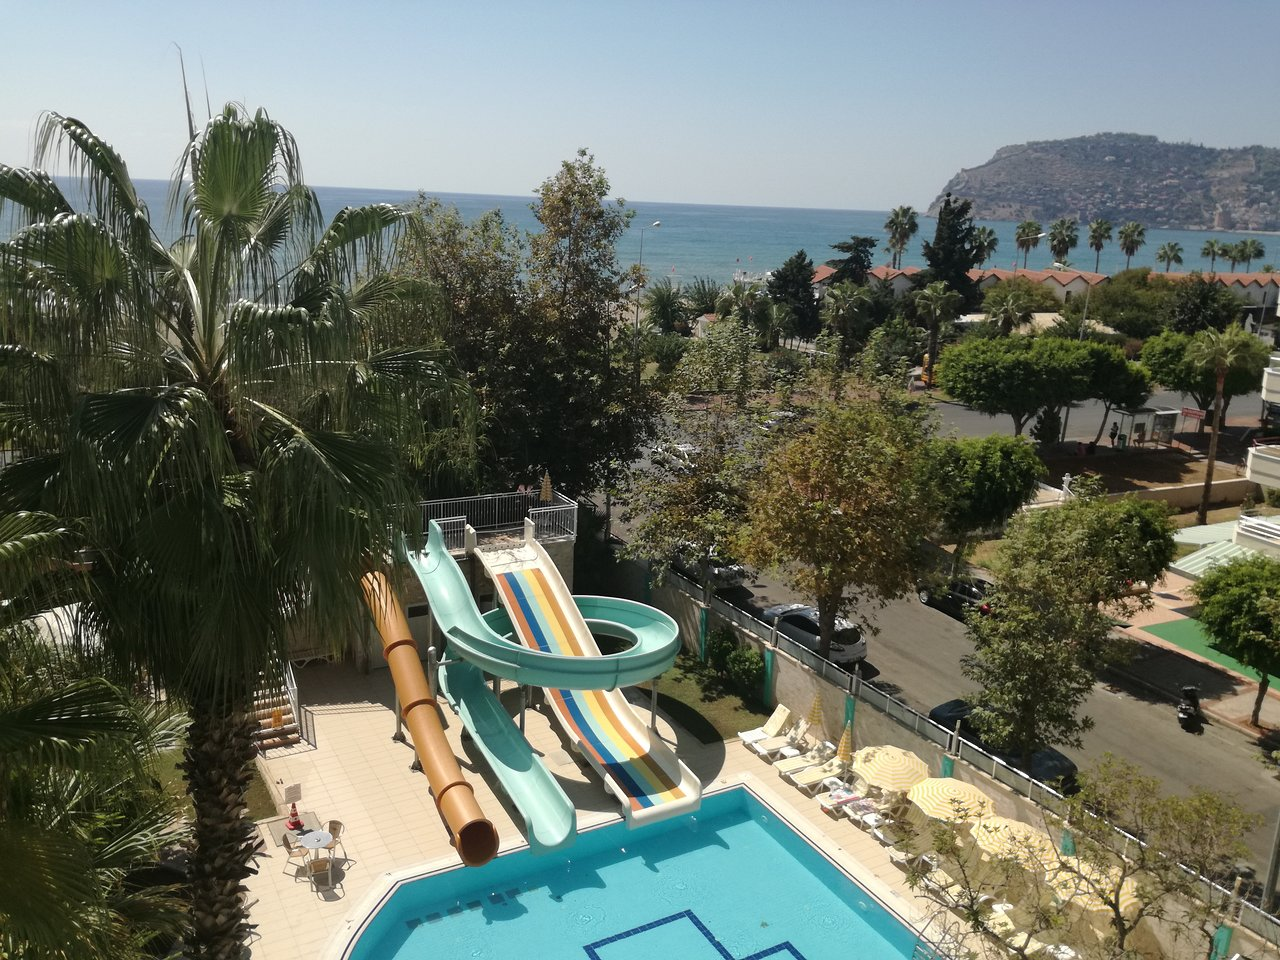 Hotel Banana 4 (Turkey, Alanya): photos, room description, service, tips and tourist reviews 29